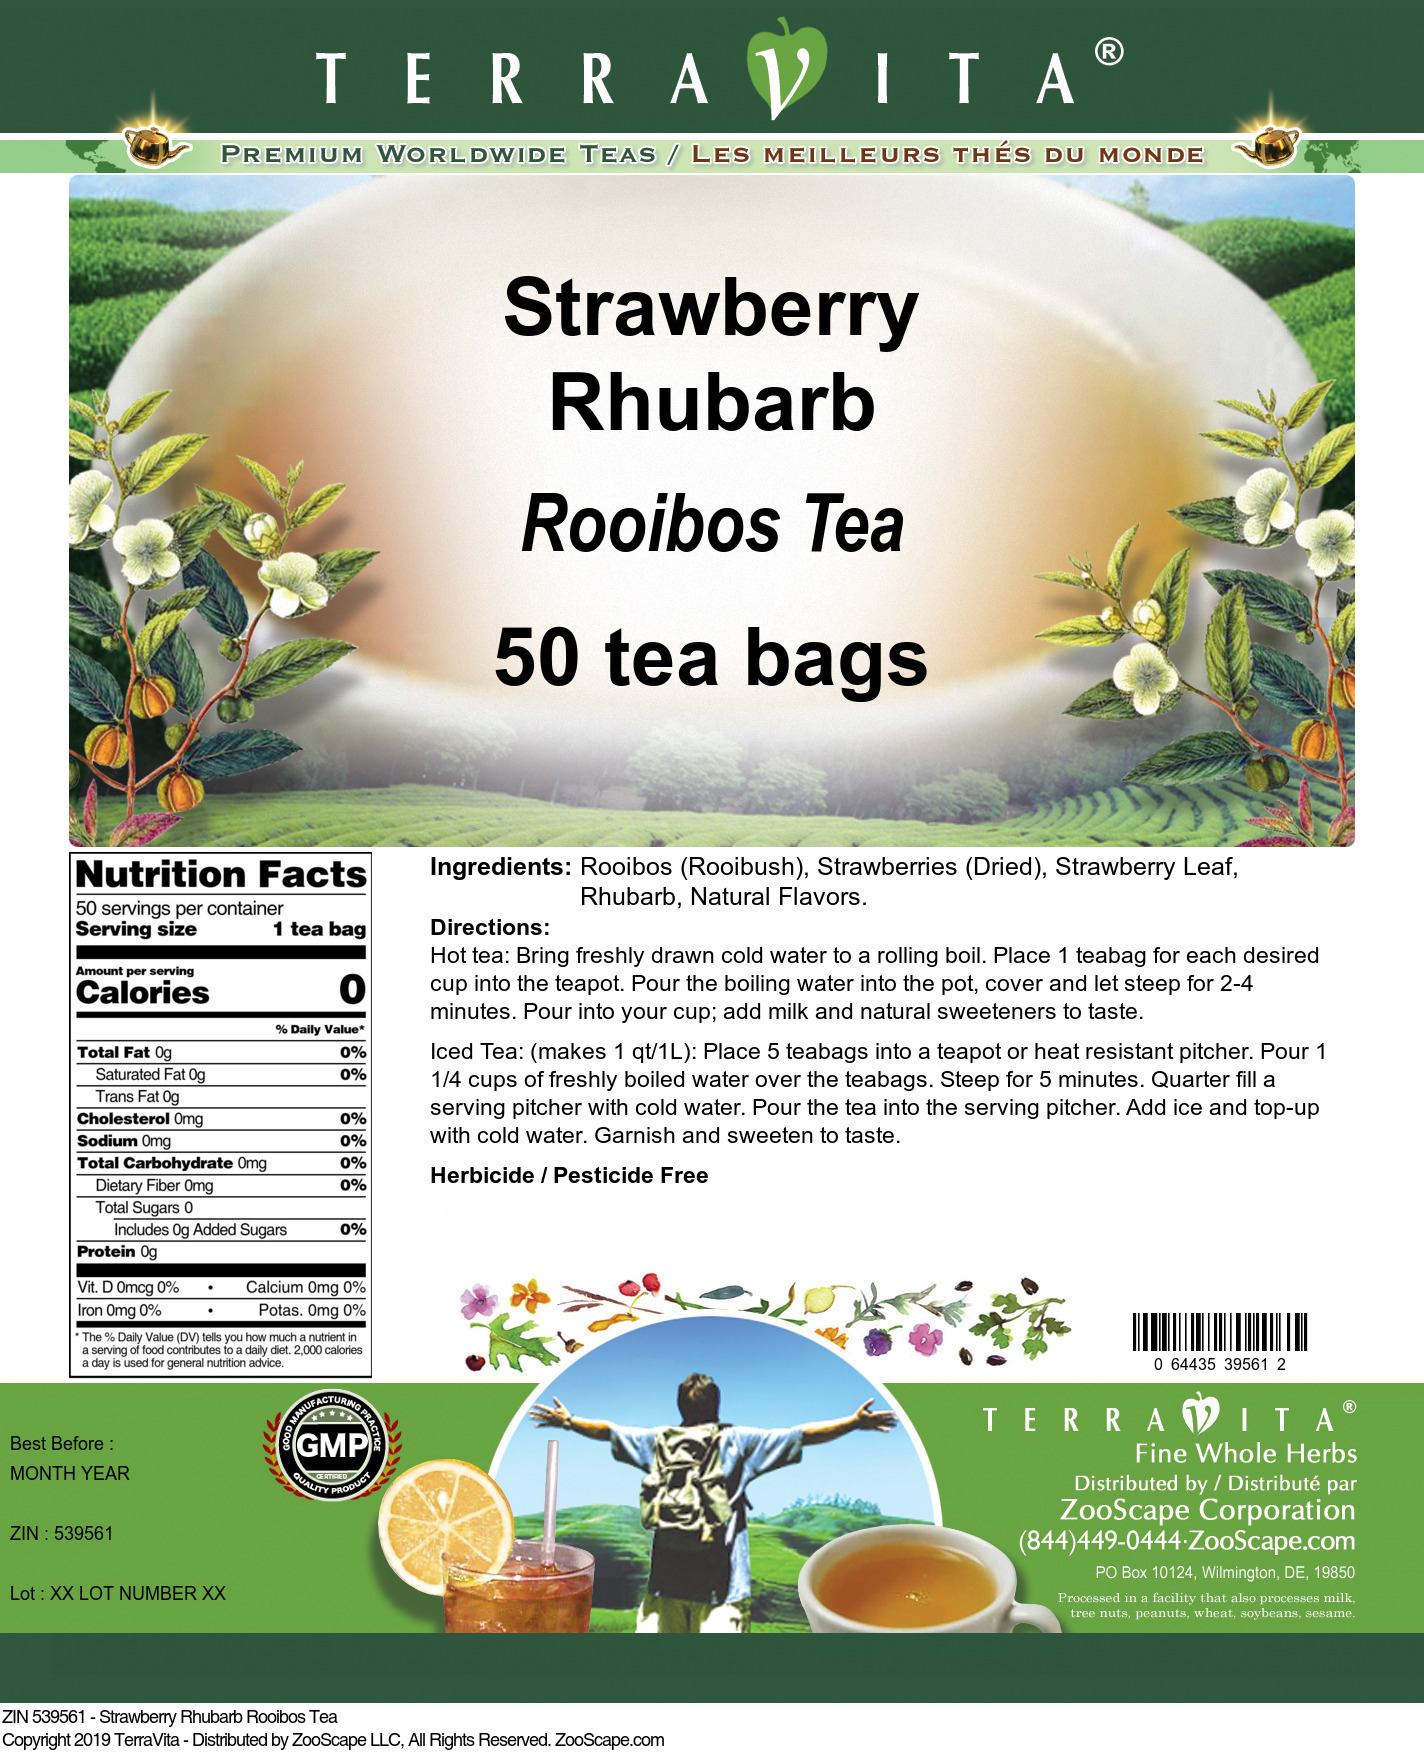 Strawberry Rhubarb Rooibos Tea